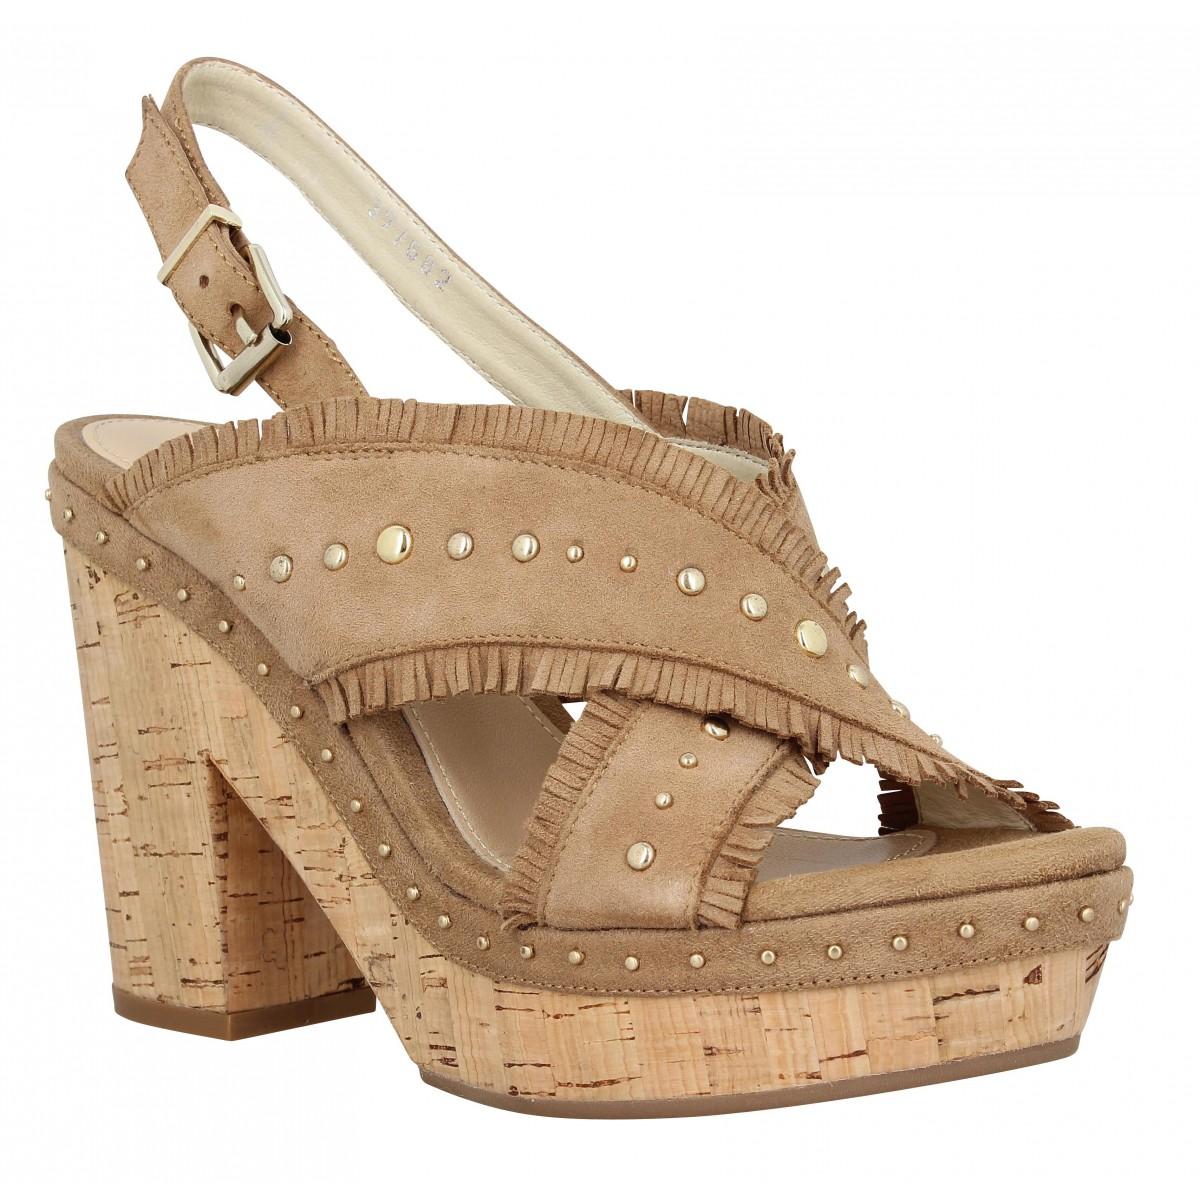 Sandales talons ALTRAOFFICINA J1000 velours Femme Beige